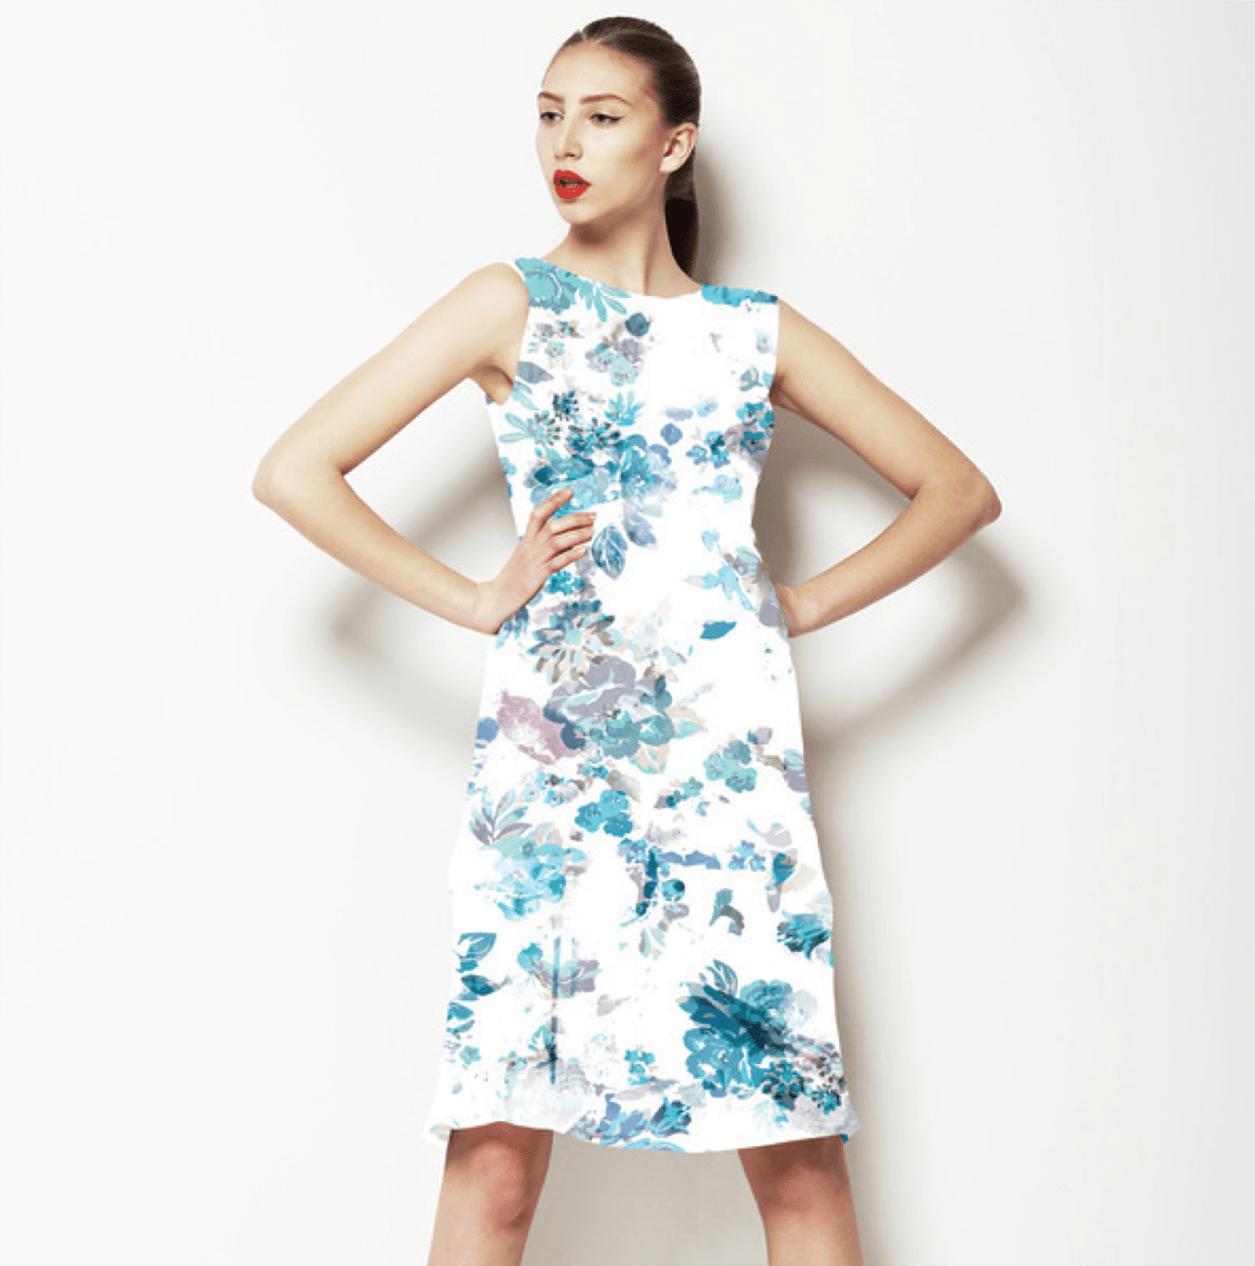 watercolour floral print dress design